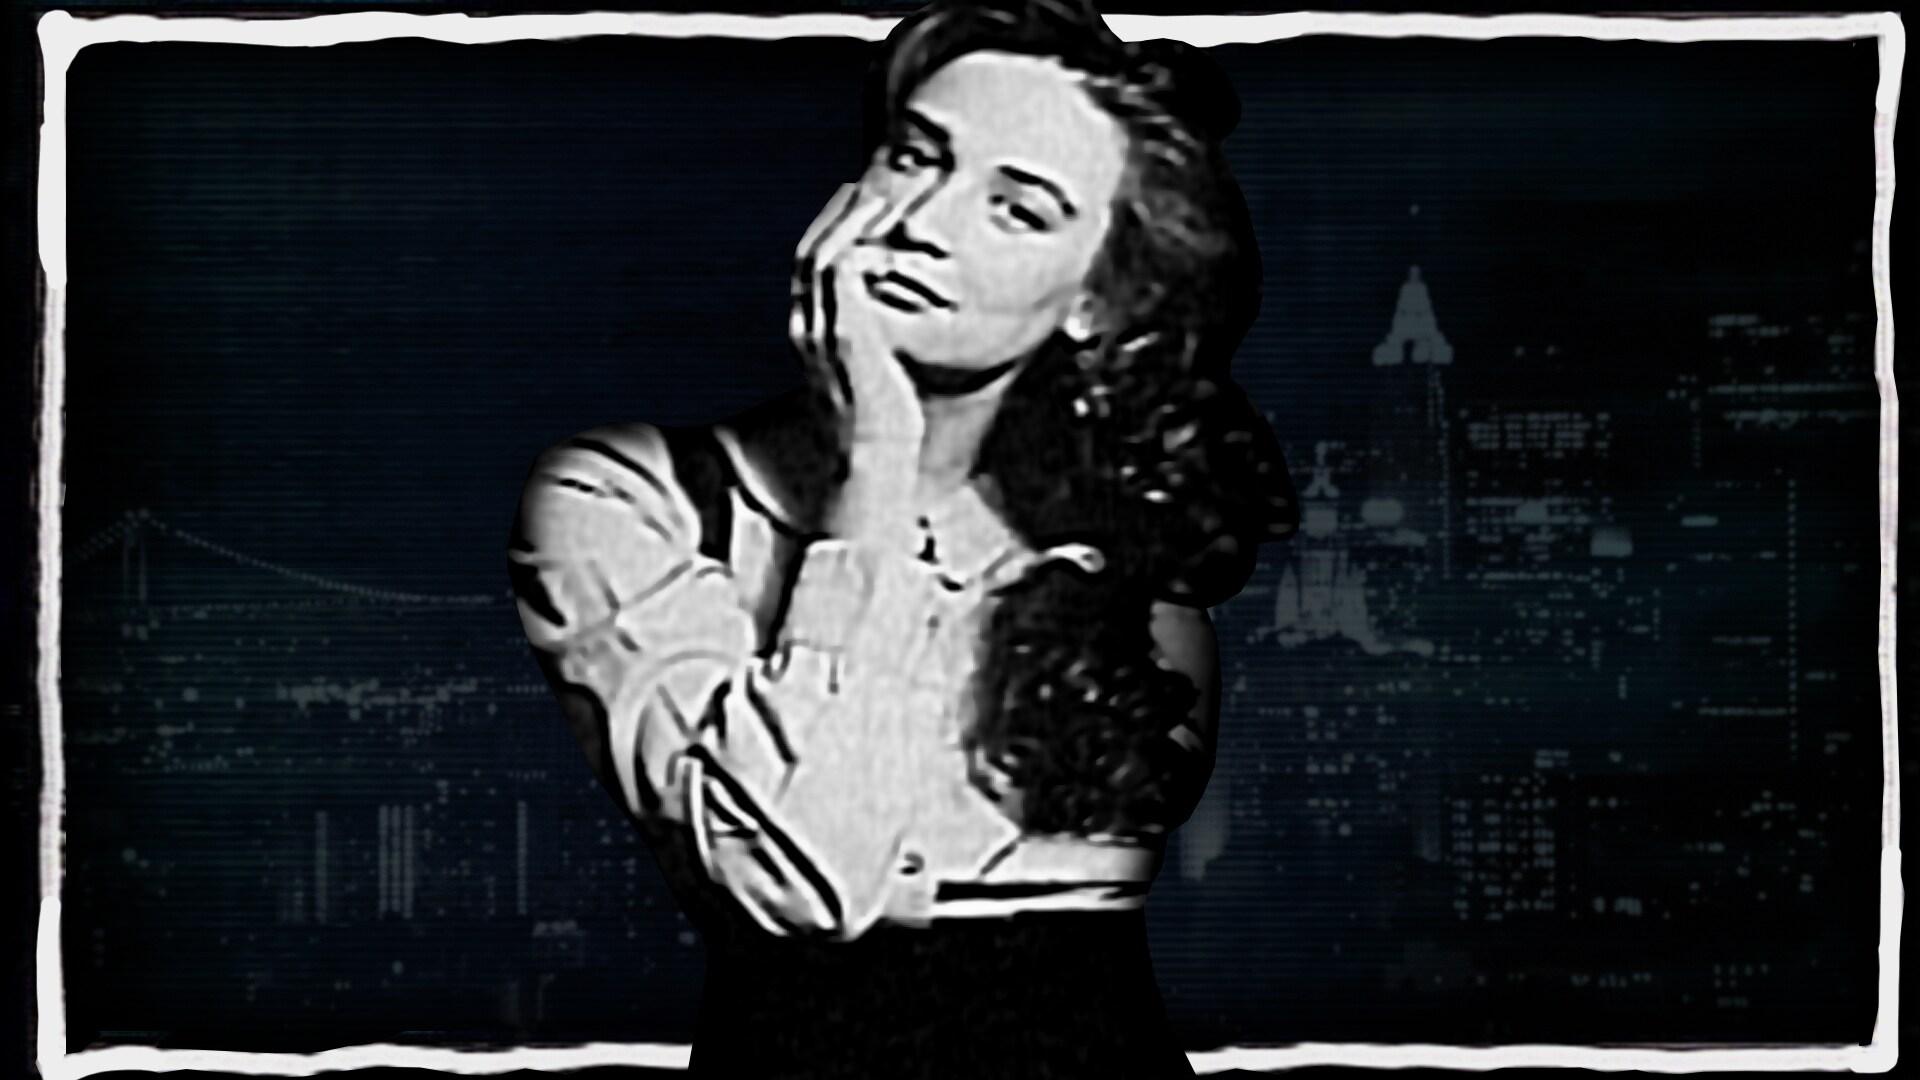 Demi Moore: November 12, 1988